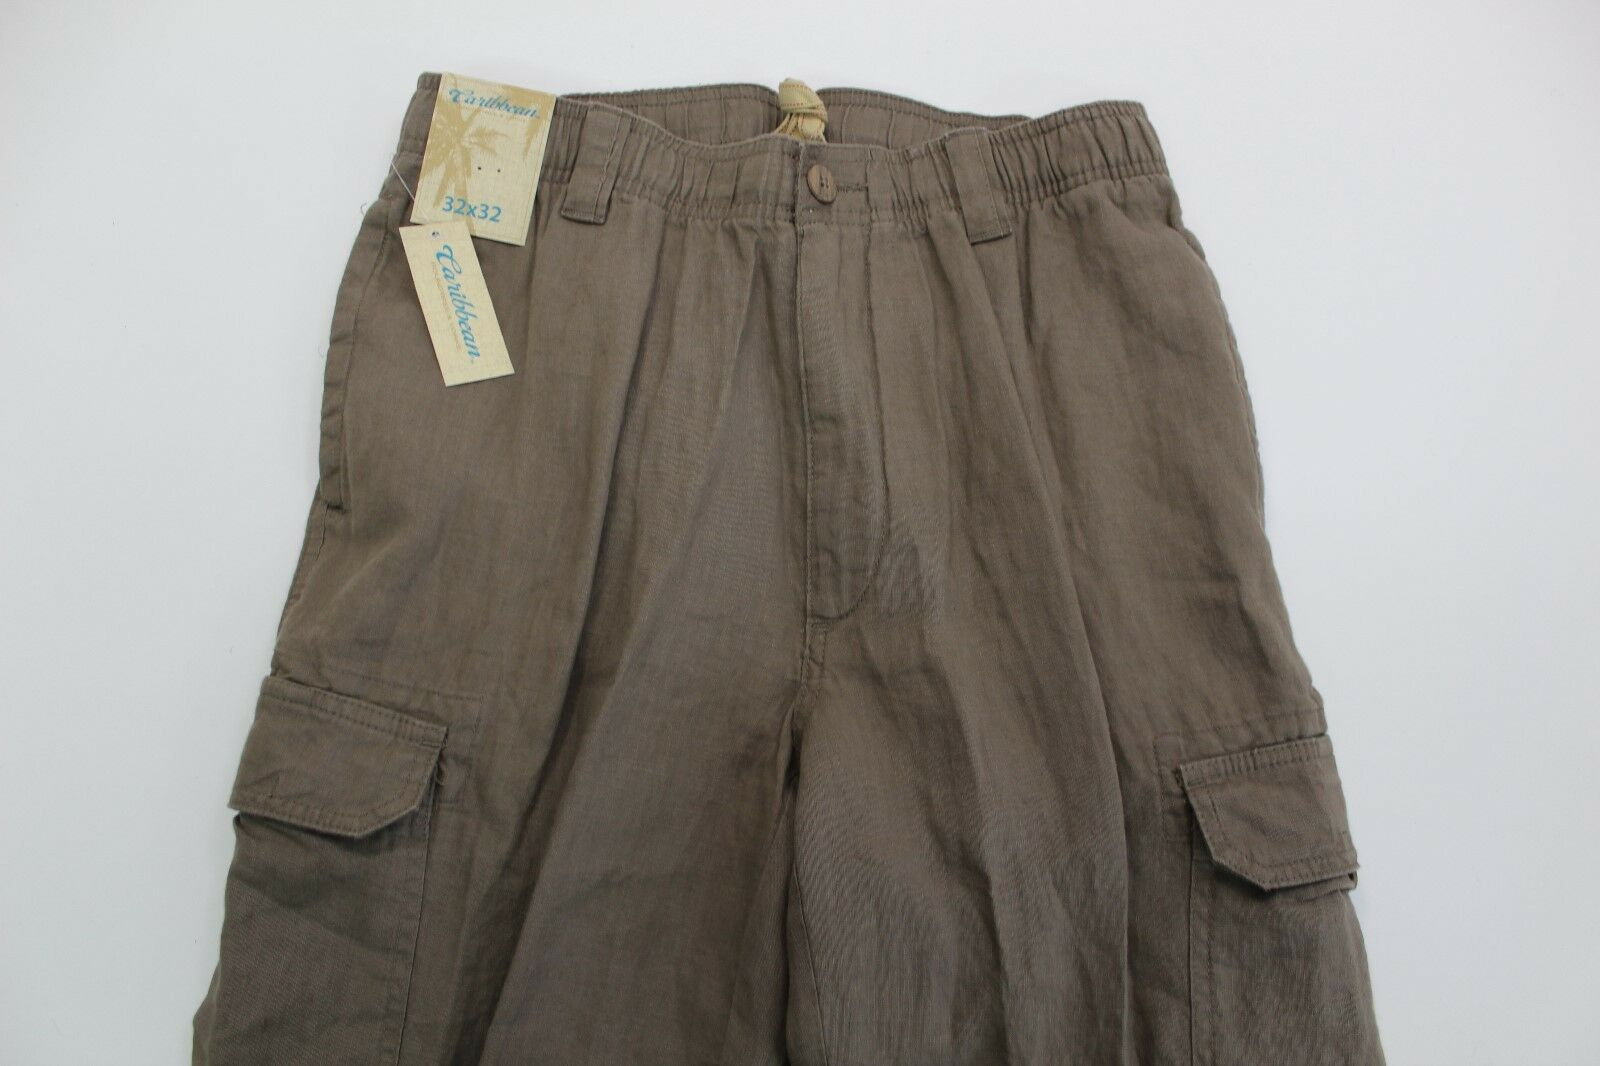 Caribbean Men's Linen Drawstring Cargo Pants-  32x32  -NWT Brownstone